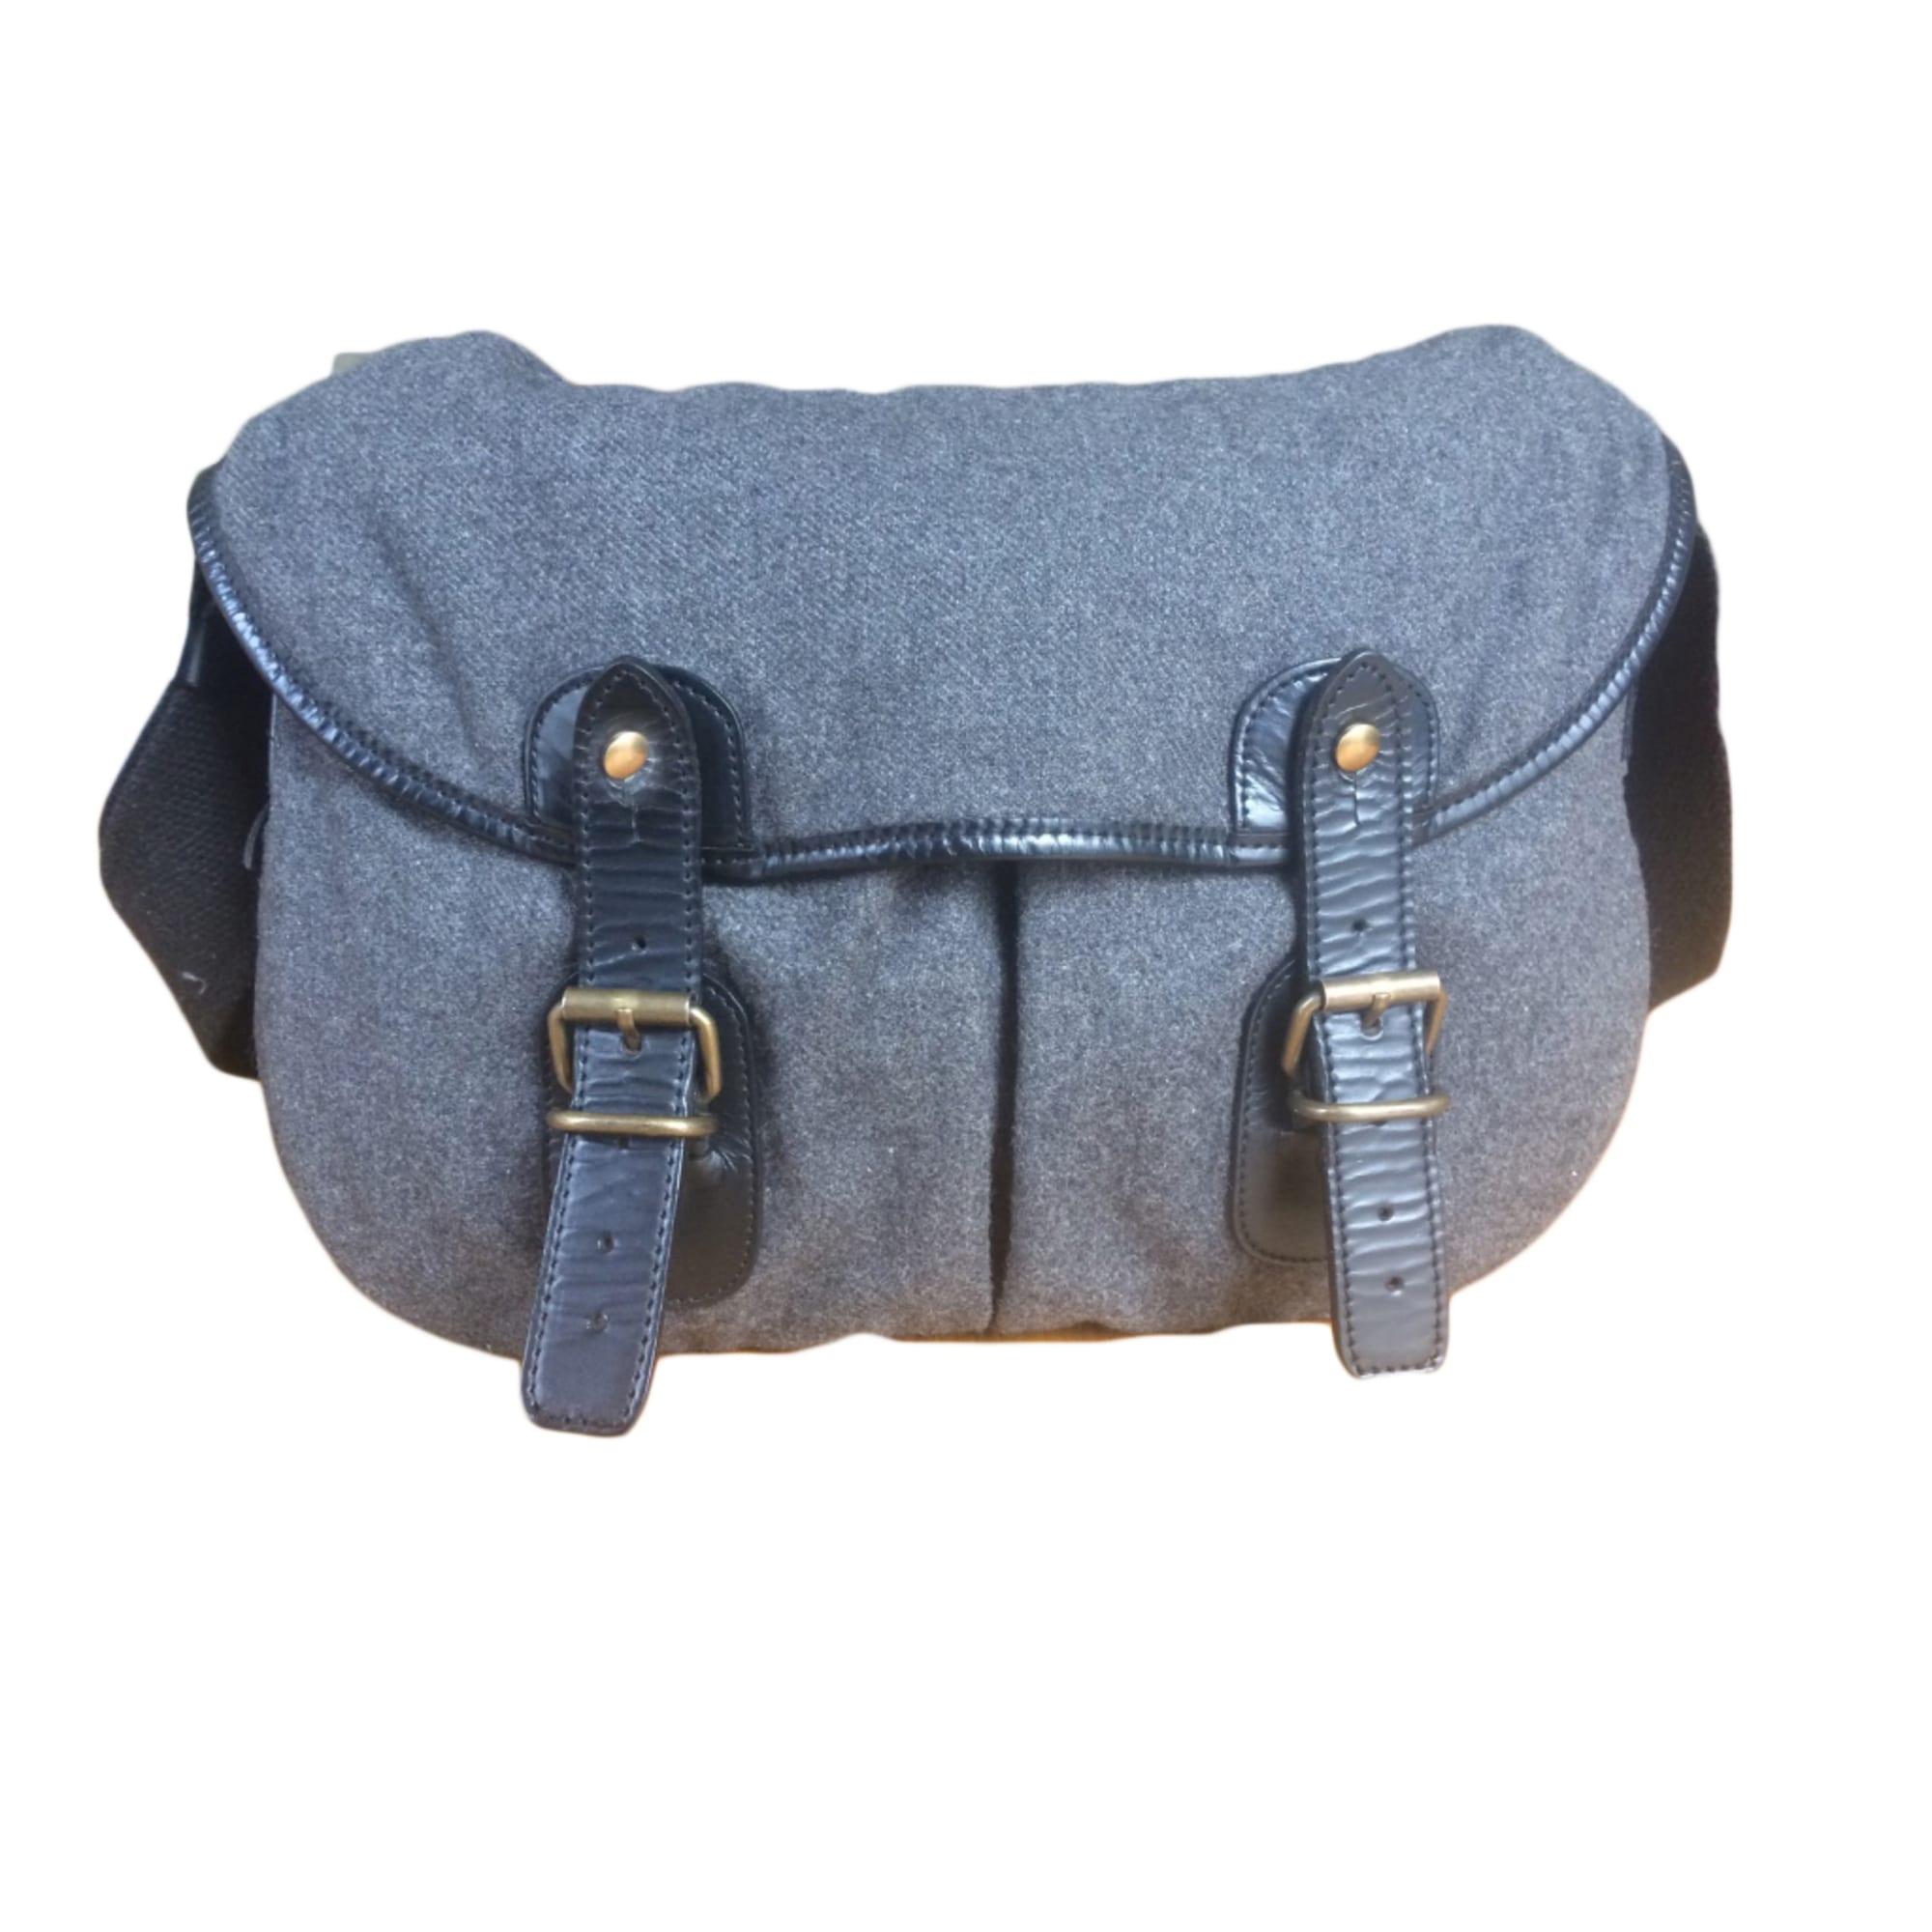 Non-Leather Shoulder Bag UPLA Gray, charcoal